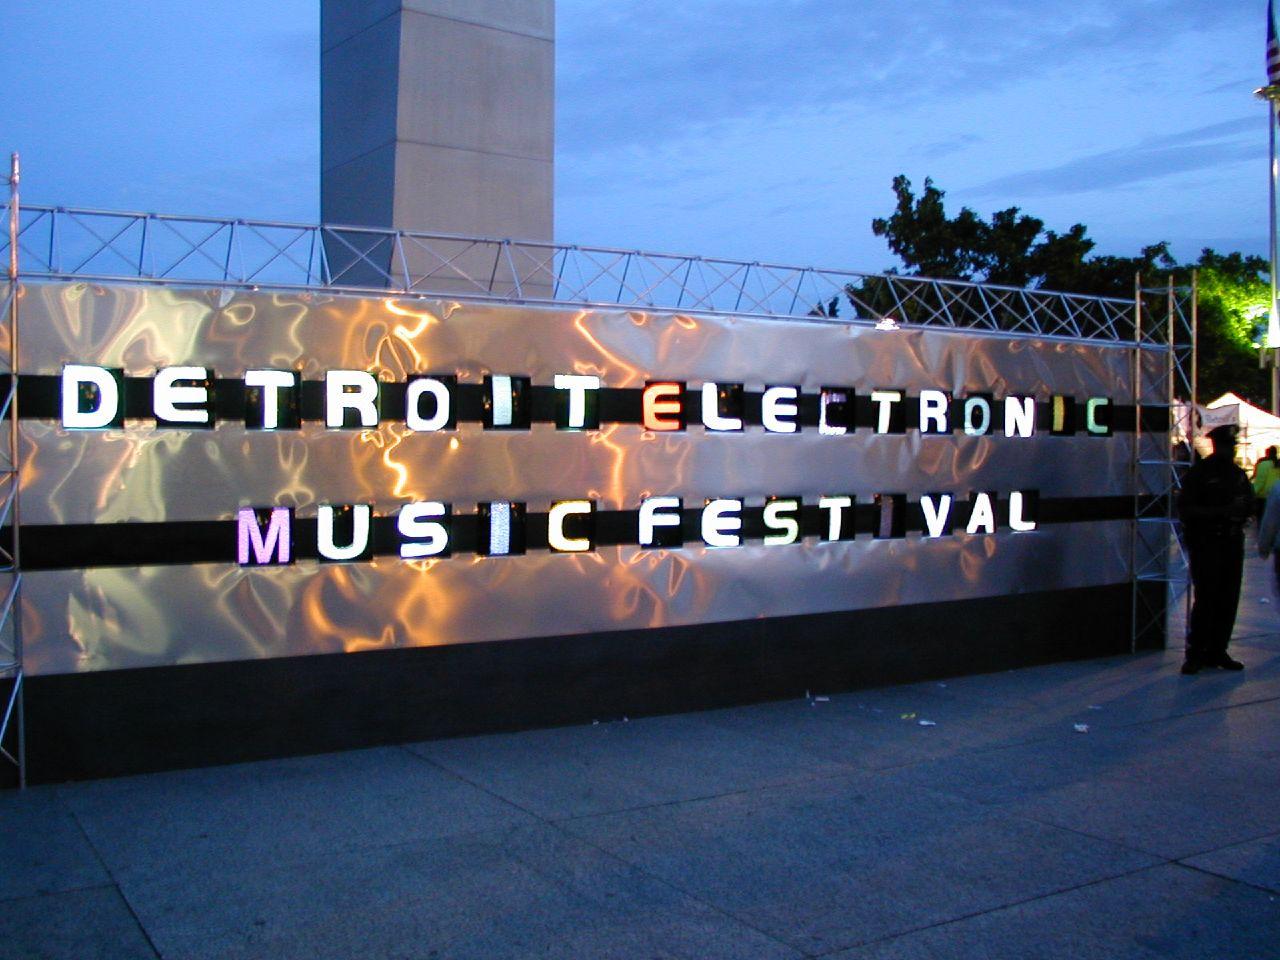 detroit electronic music festival wikipedia